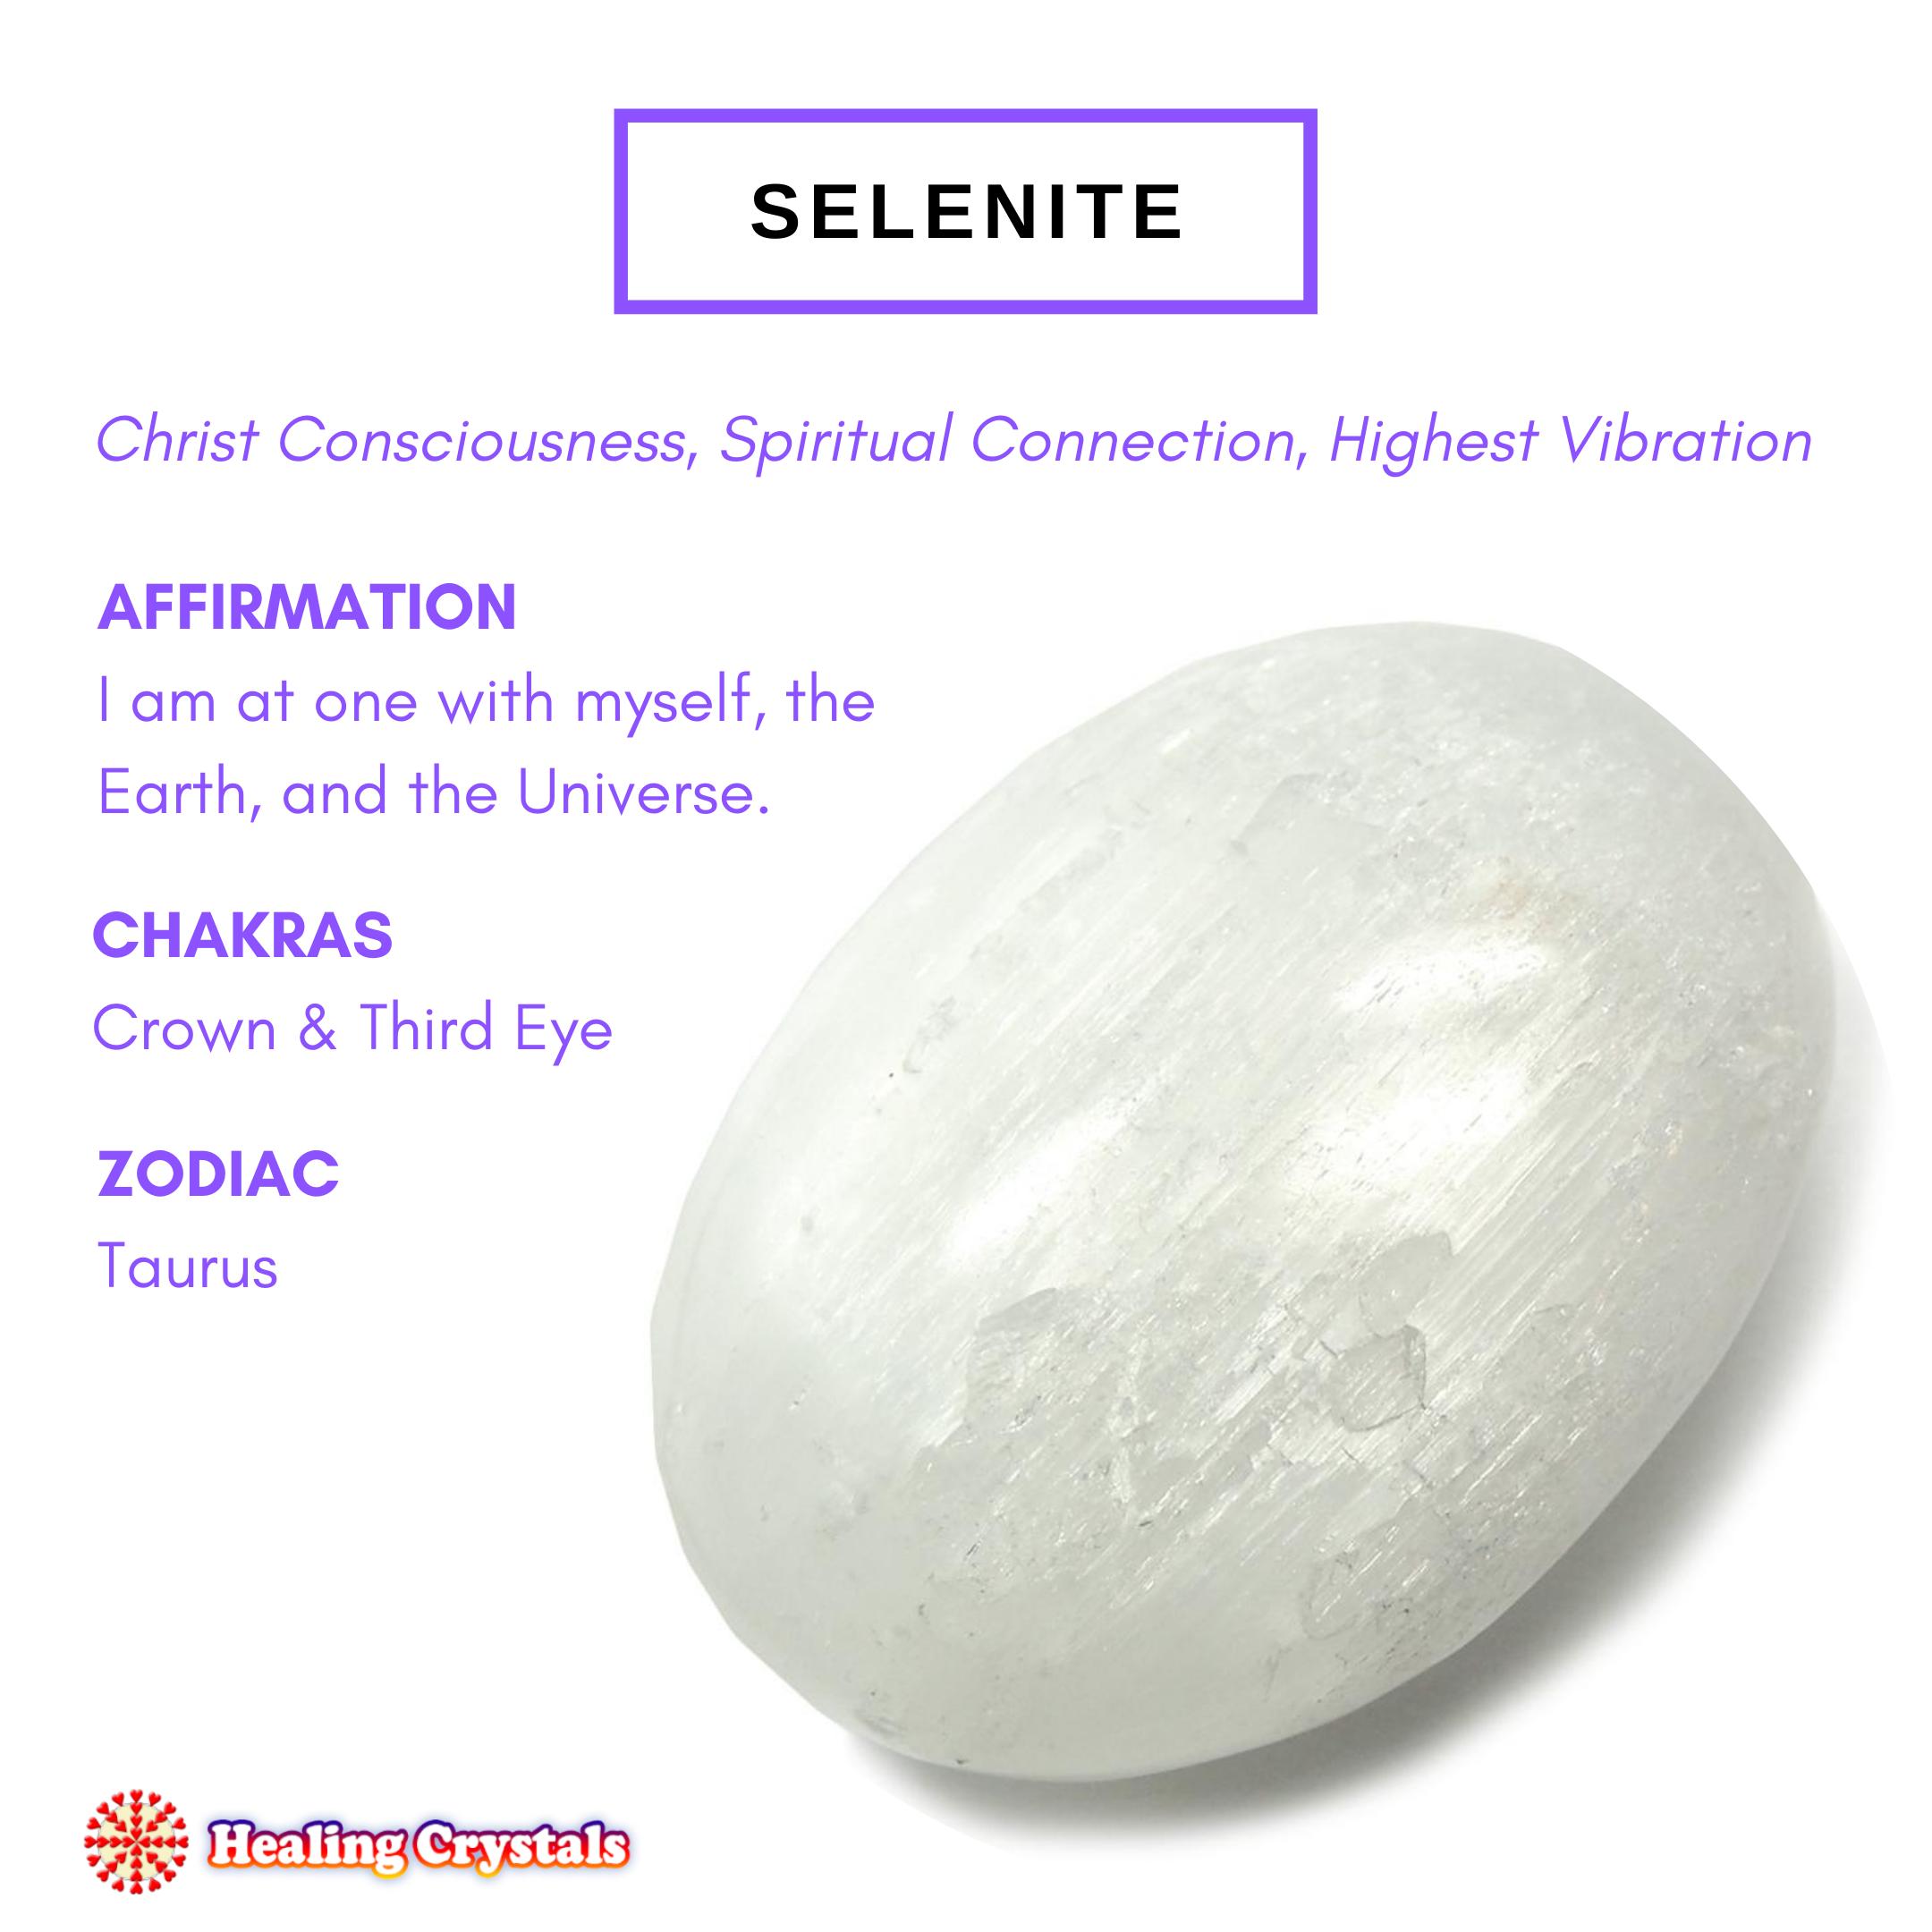 Selenite Satin Spar Summary Of Properties Chakras And Zodiac Sign Associations Spiritual Crystals Healing Rocks Crystal Healing Stones